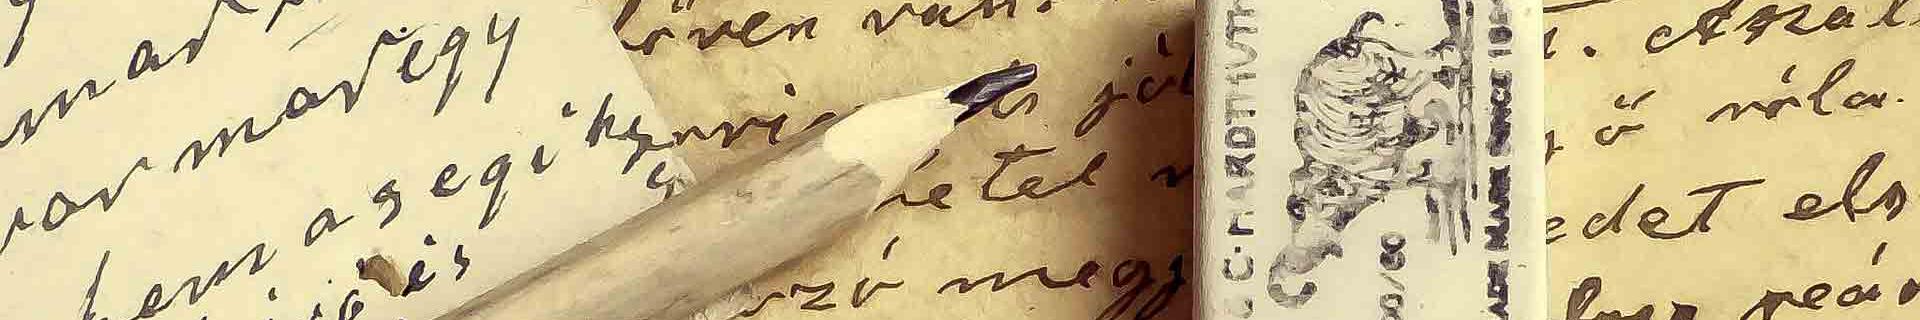 Handschrift, Kalligraphie, Design